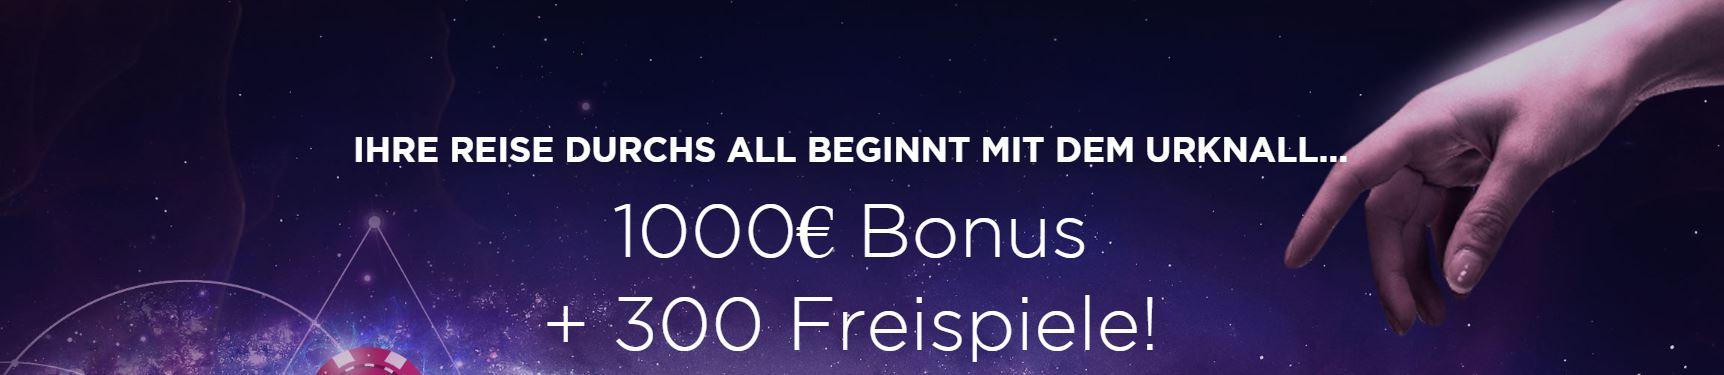 genesis €1000 bonus + 300 free spins